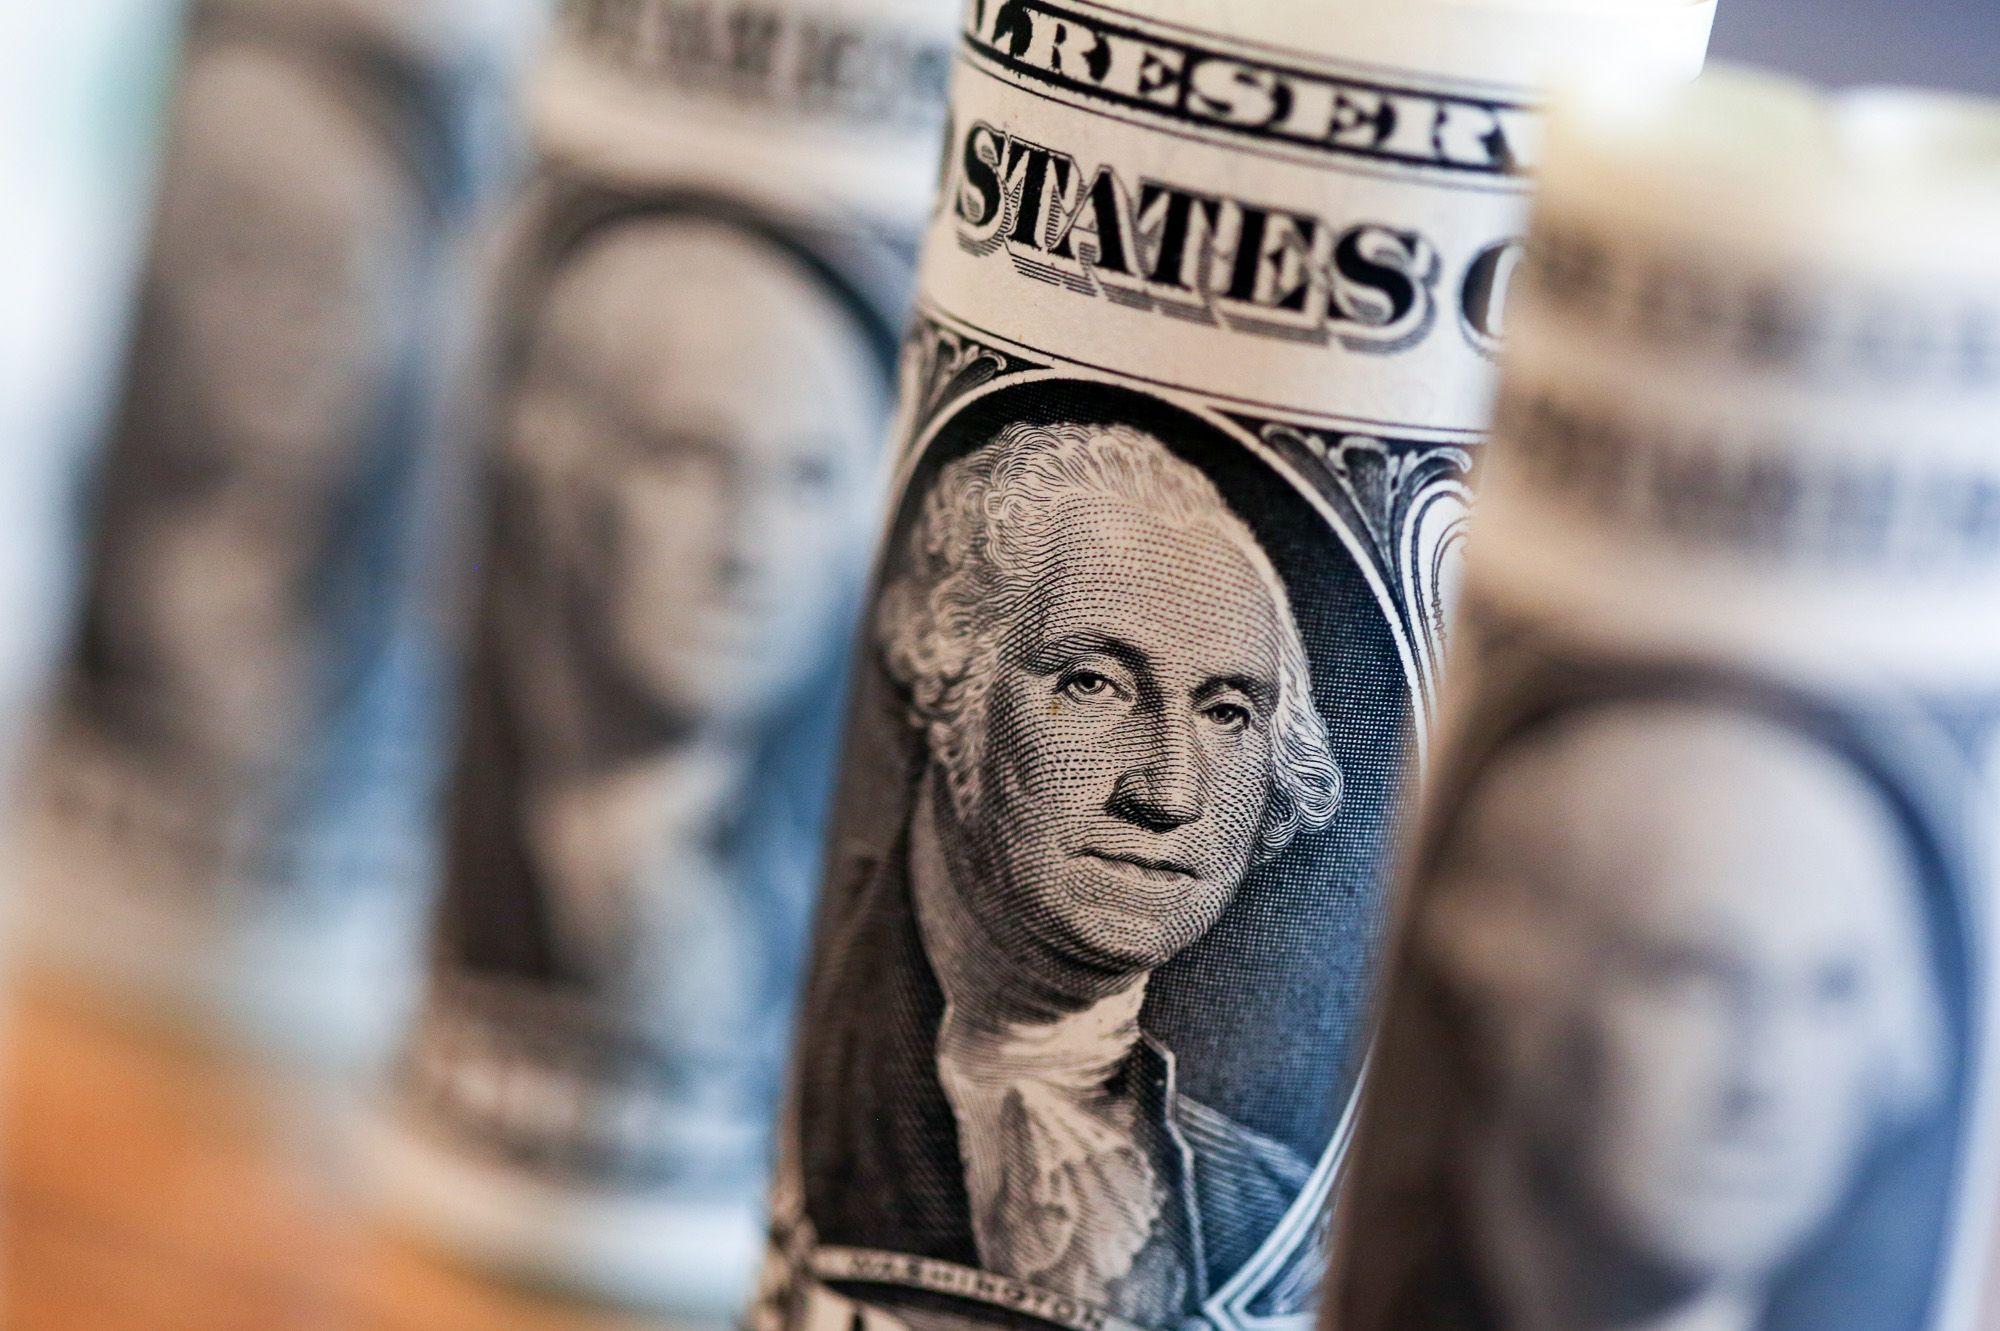 Hedge-Fund Titans Hohn, Mandel Lead $178 Billion Year of Profits